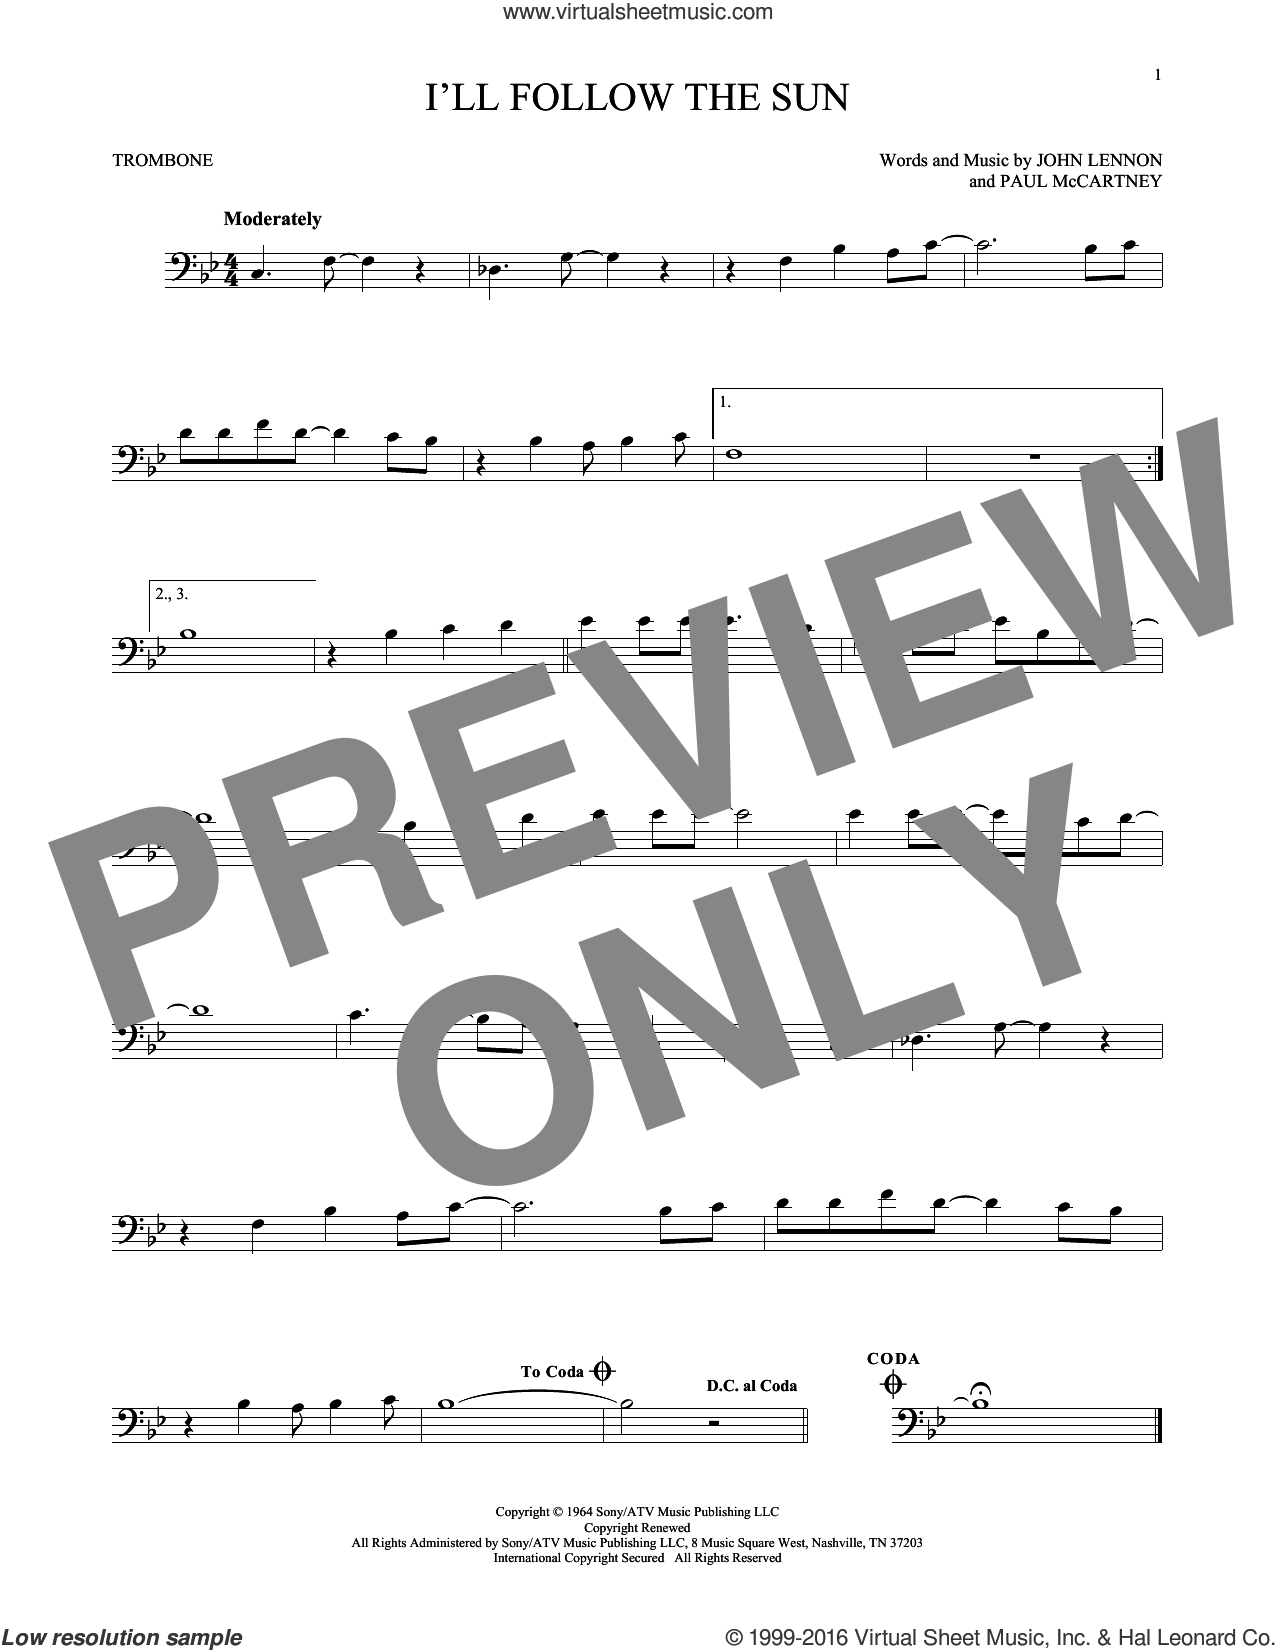 I'll Follow The Sun sheet music for trombone solo by The Beatles, John Lennon and Paul McCartney, intermediate skill level